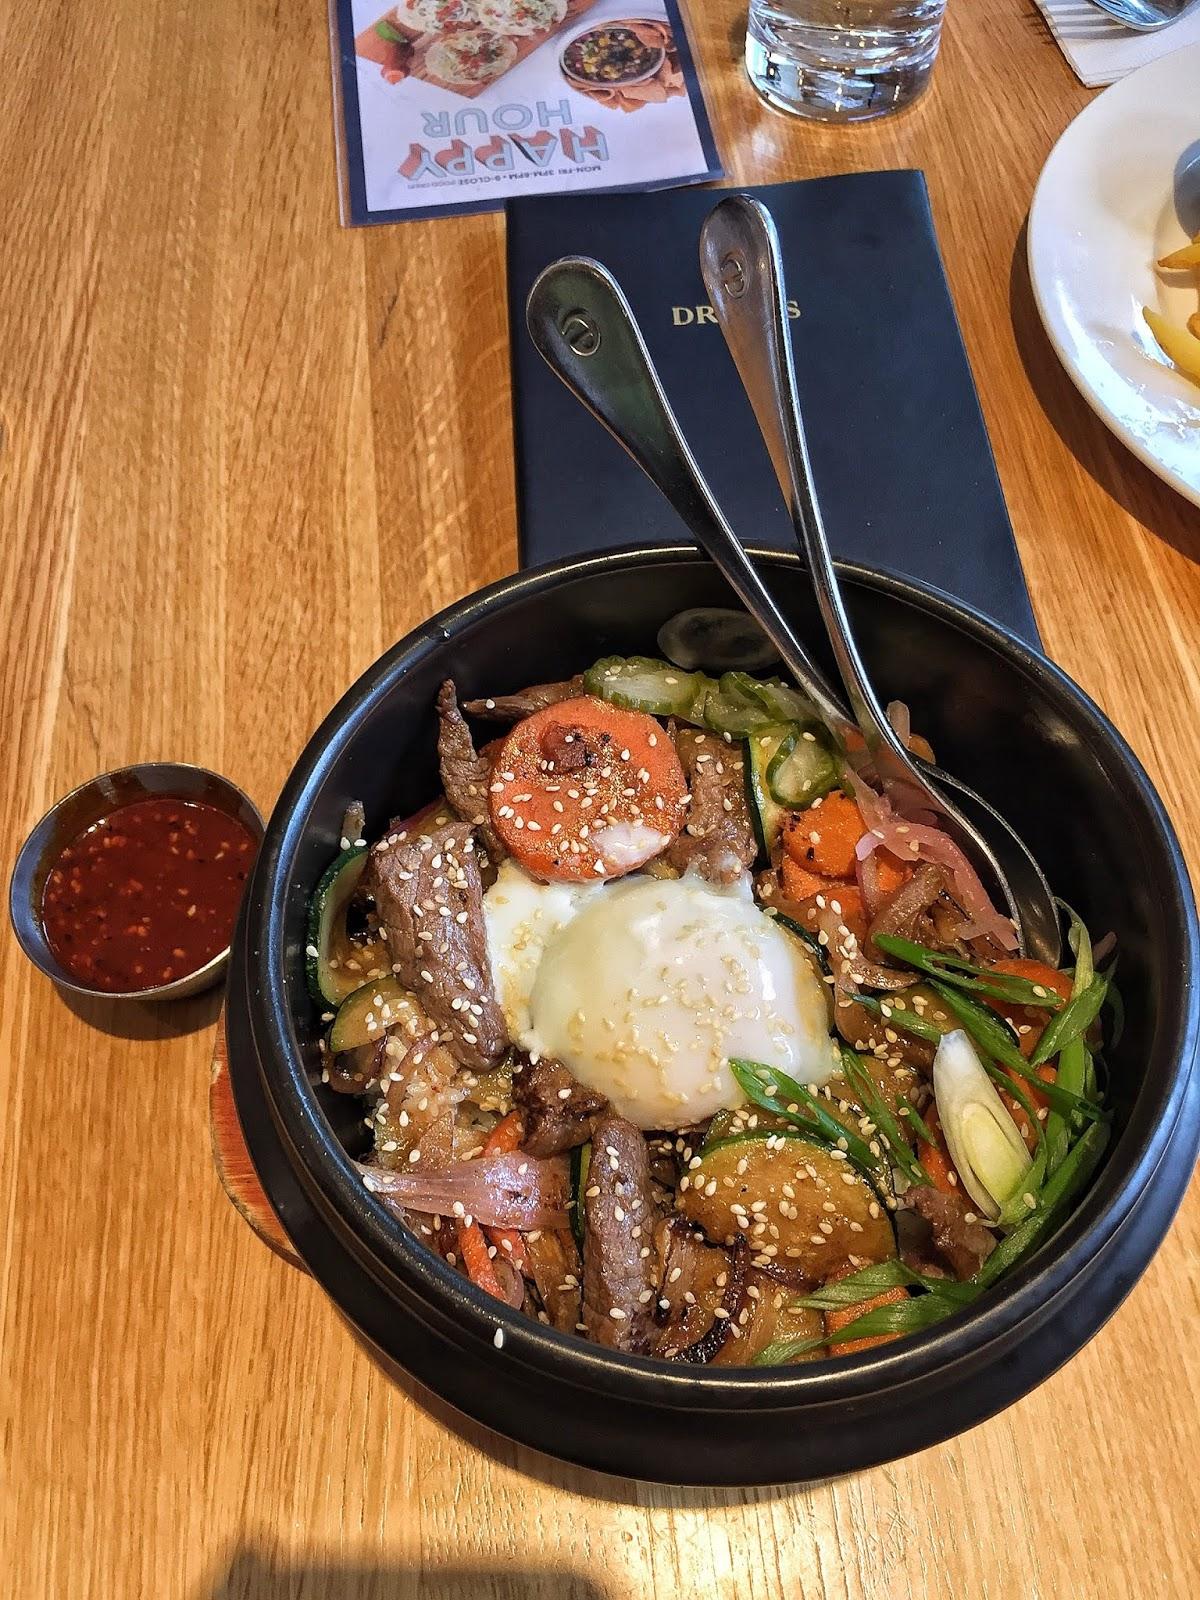 Zain's Halal Reviews: Earl's Kitchen and Bar: A More